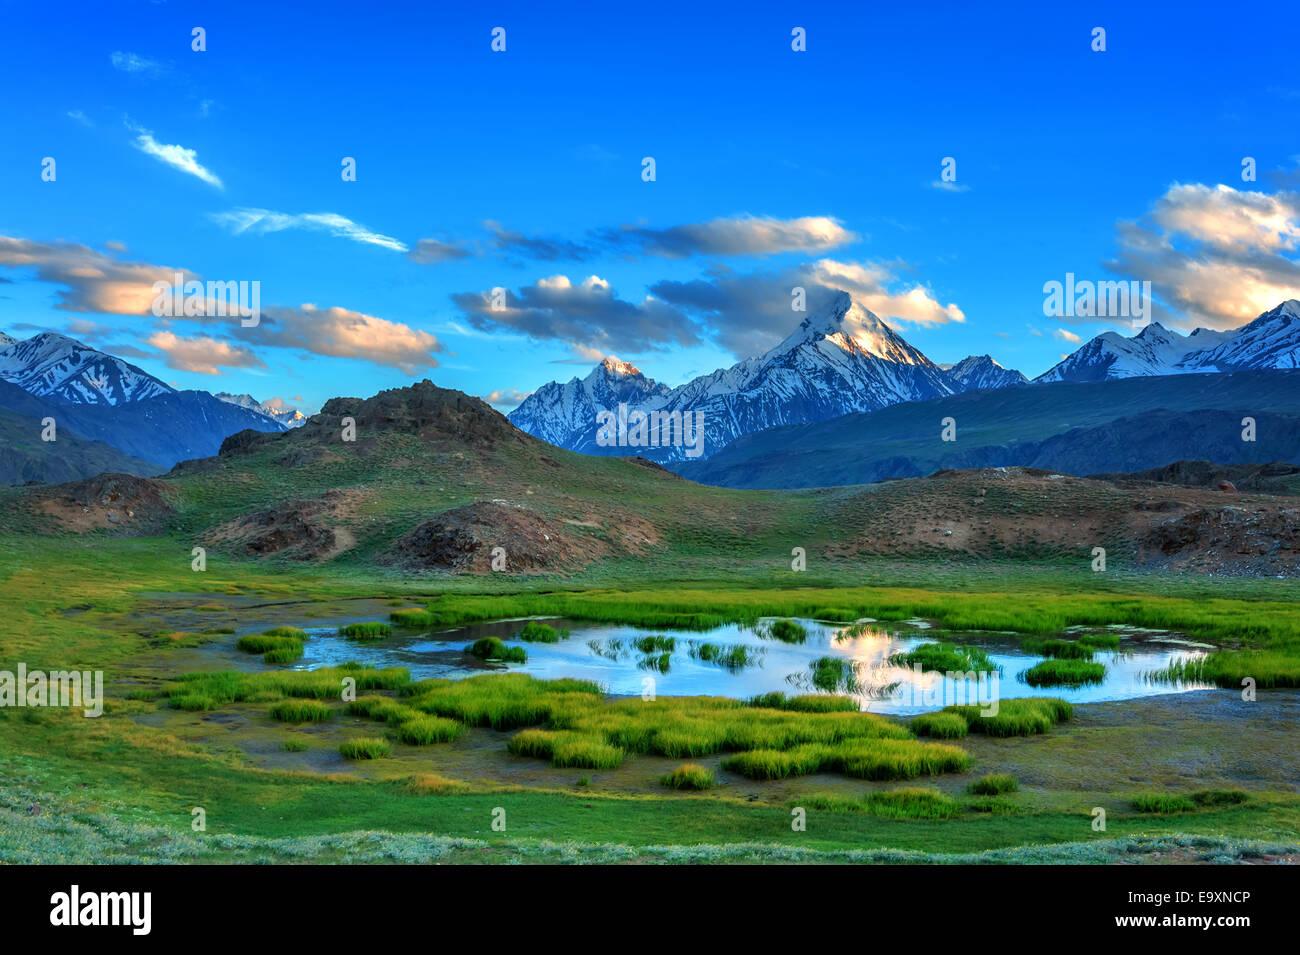 himalayas lake in summer time - Stock Image